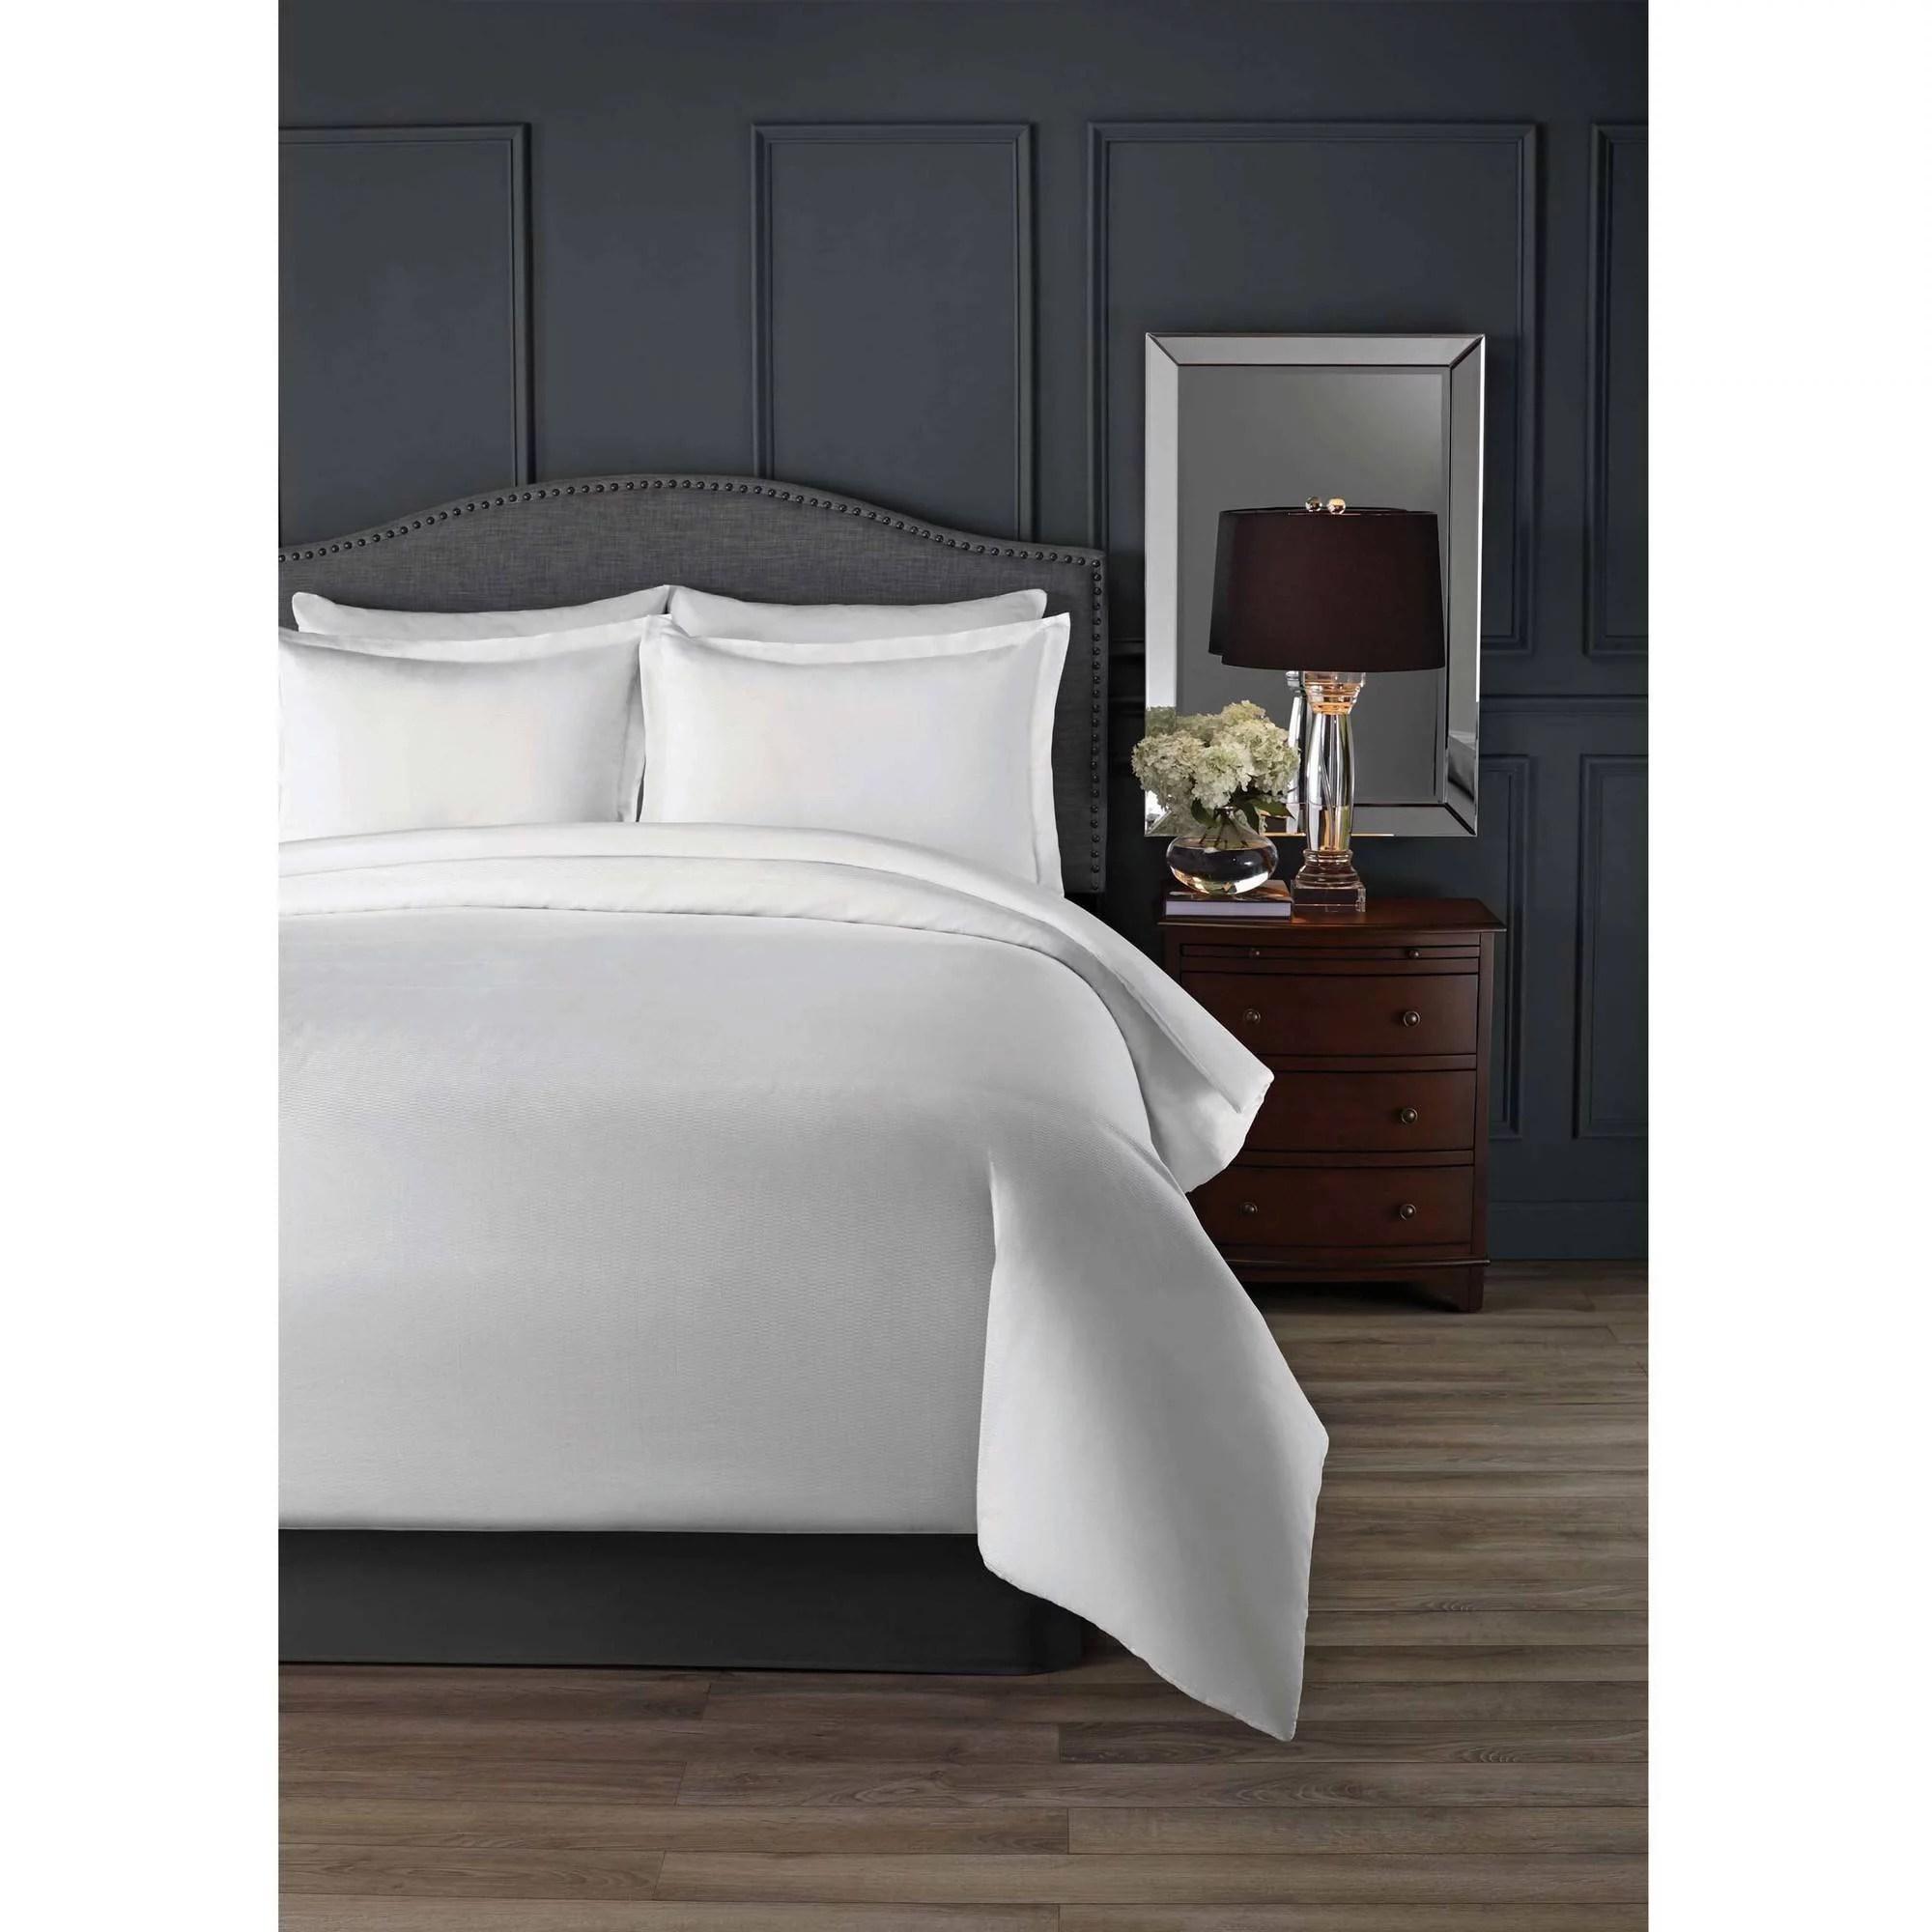 hotel style king comforter set 3 piece